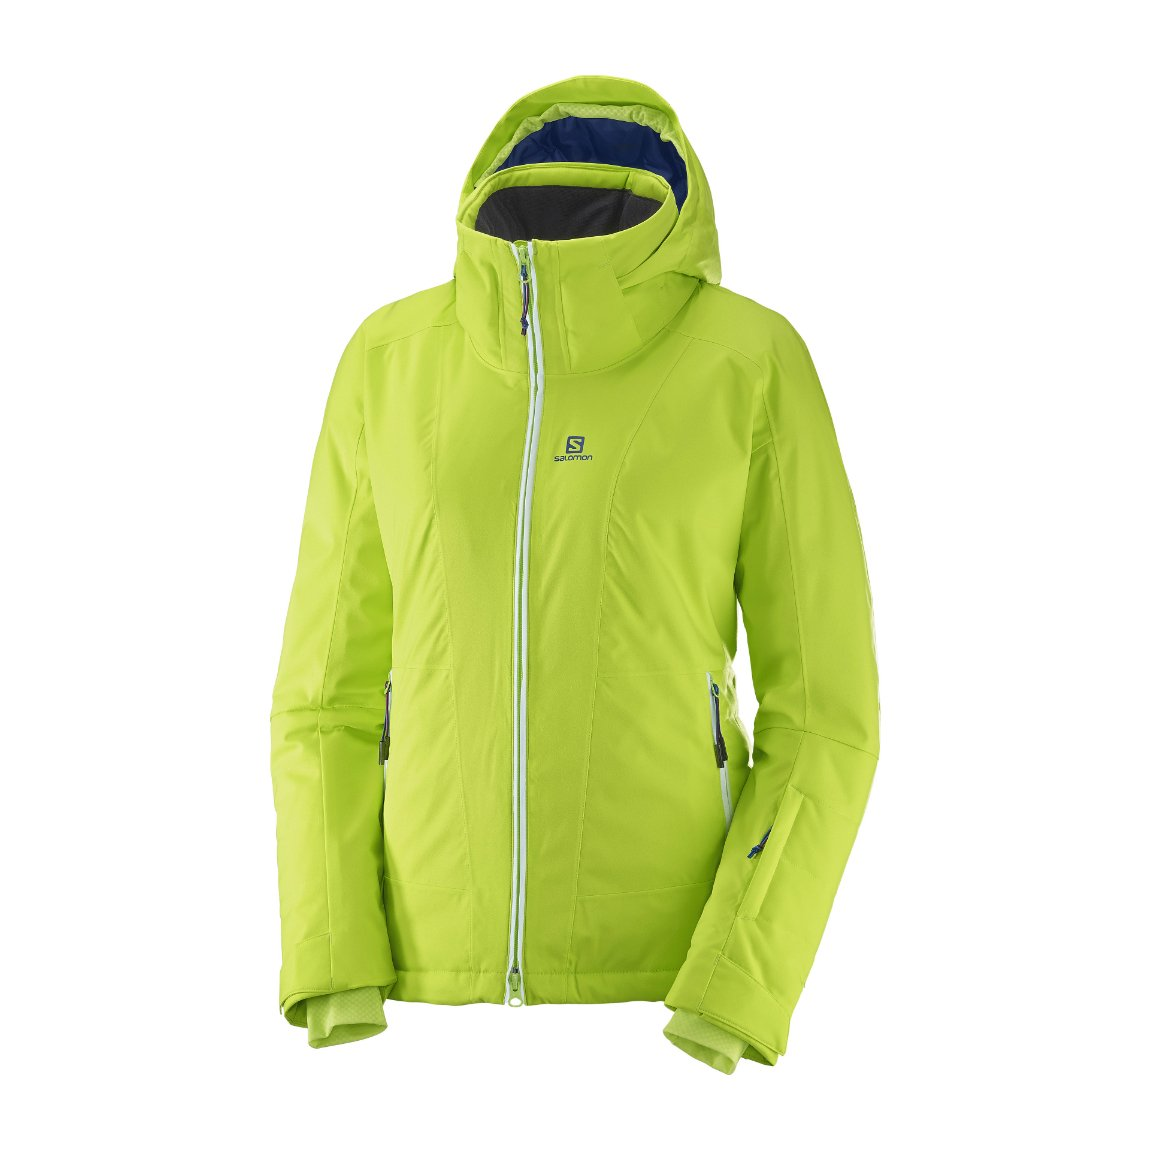 Dámská lyžařská bunda Salomon Iceglory Jacket W L37476100 - Actisport.cz e6b3311d3b